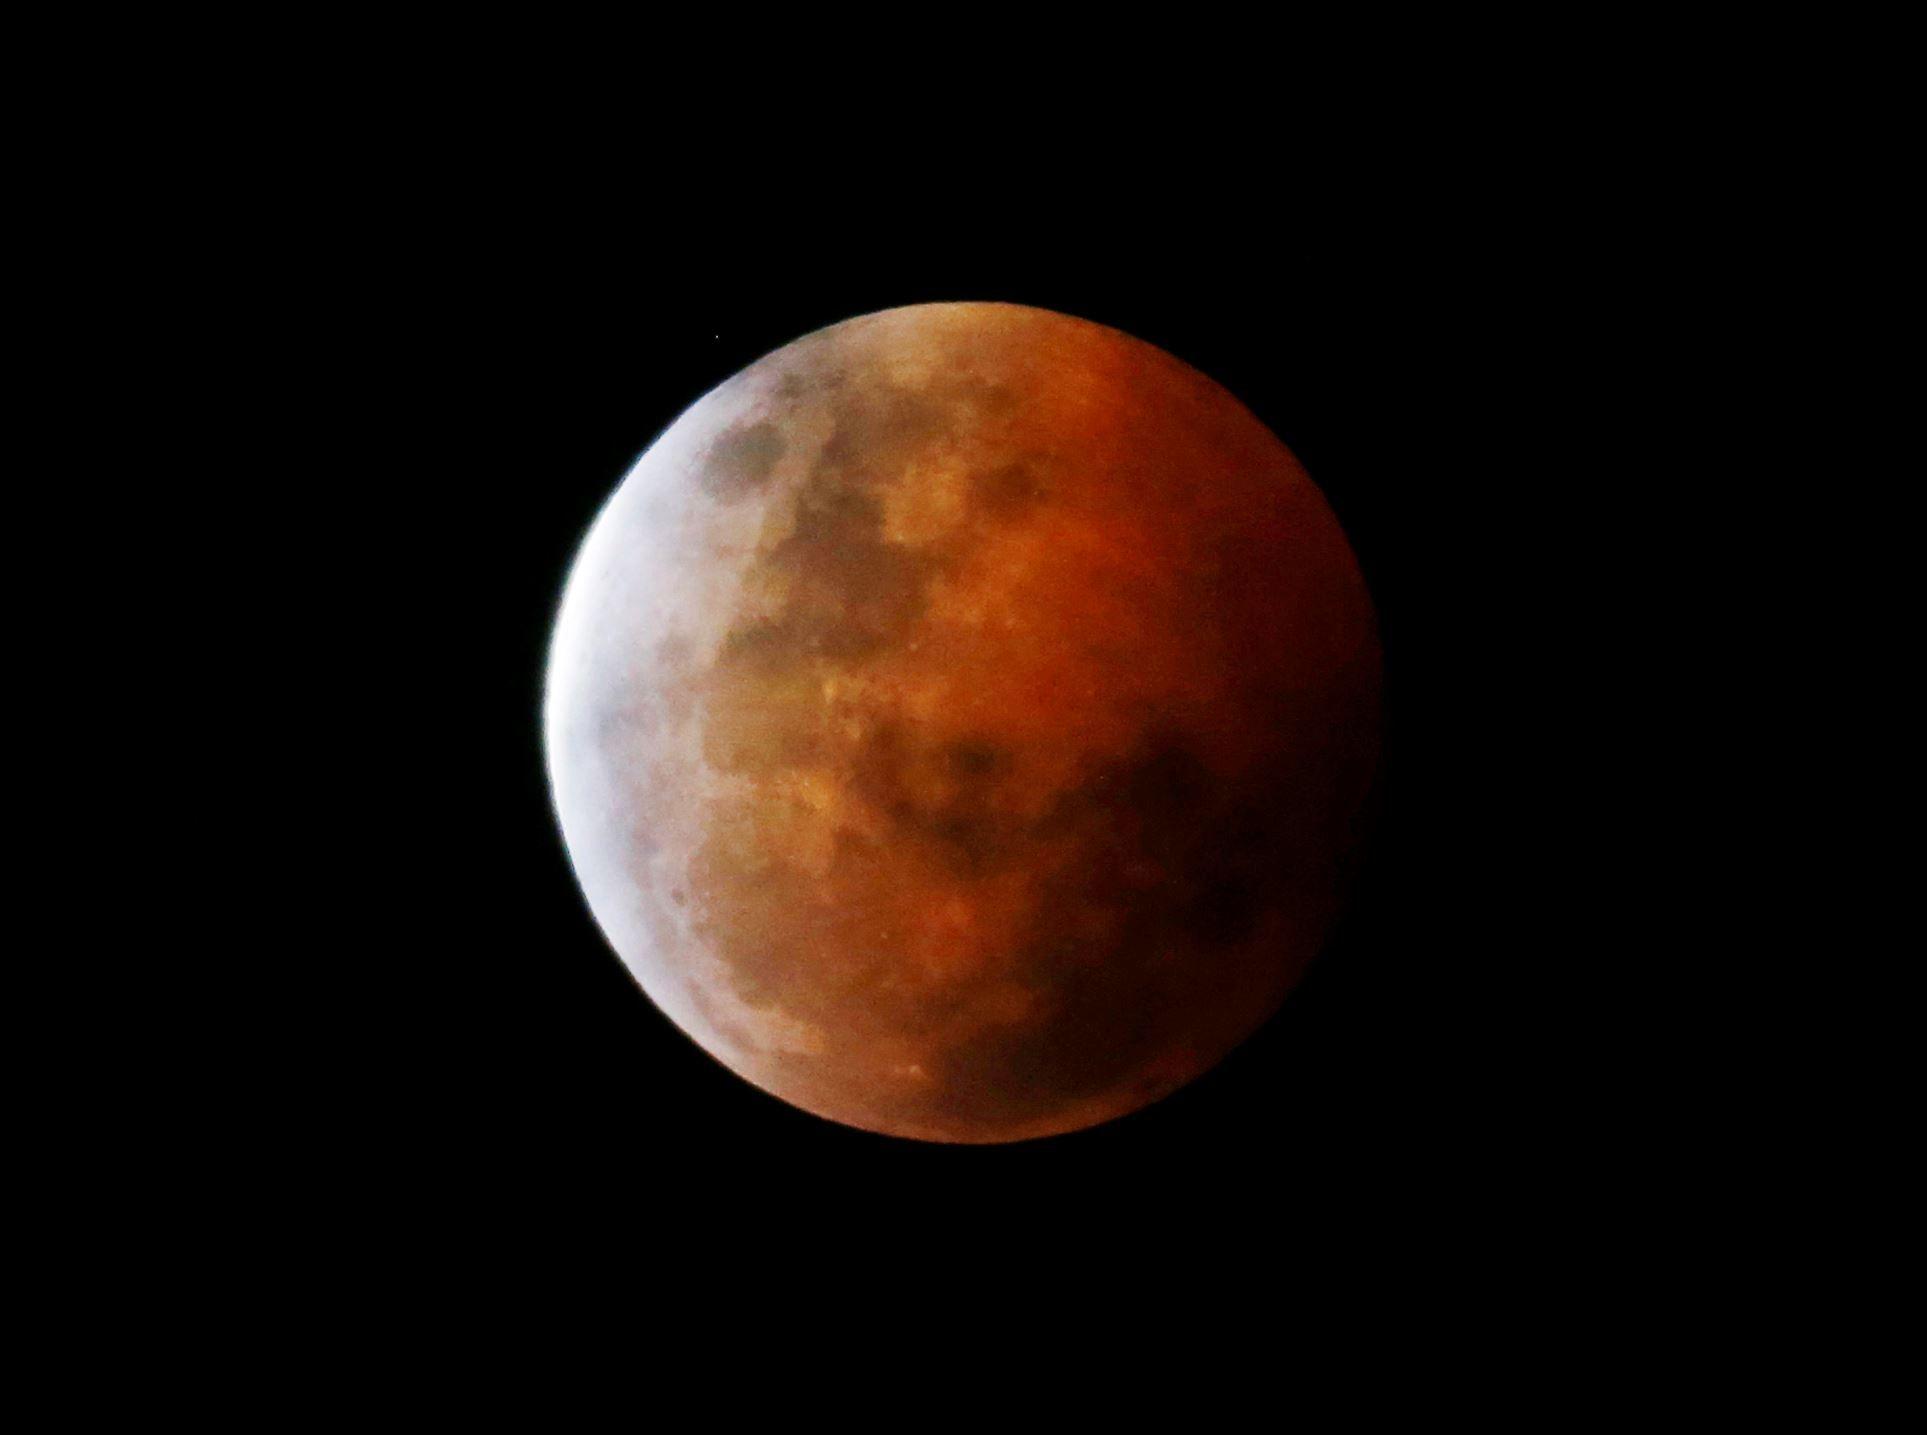 'Blood Moon' lunar eclipse